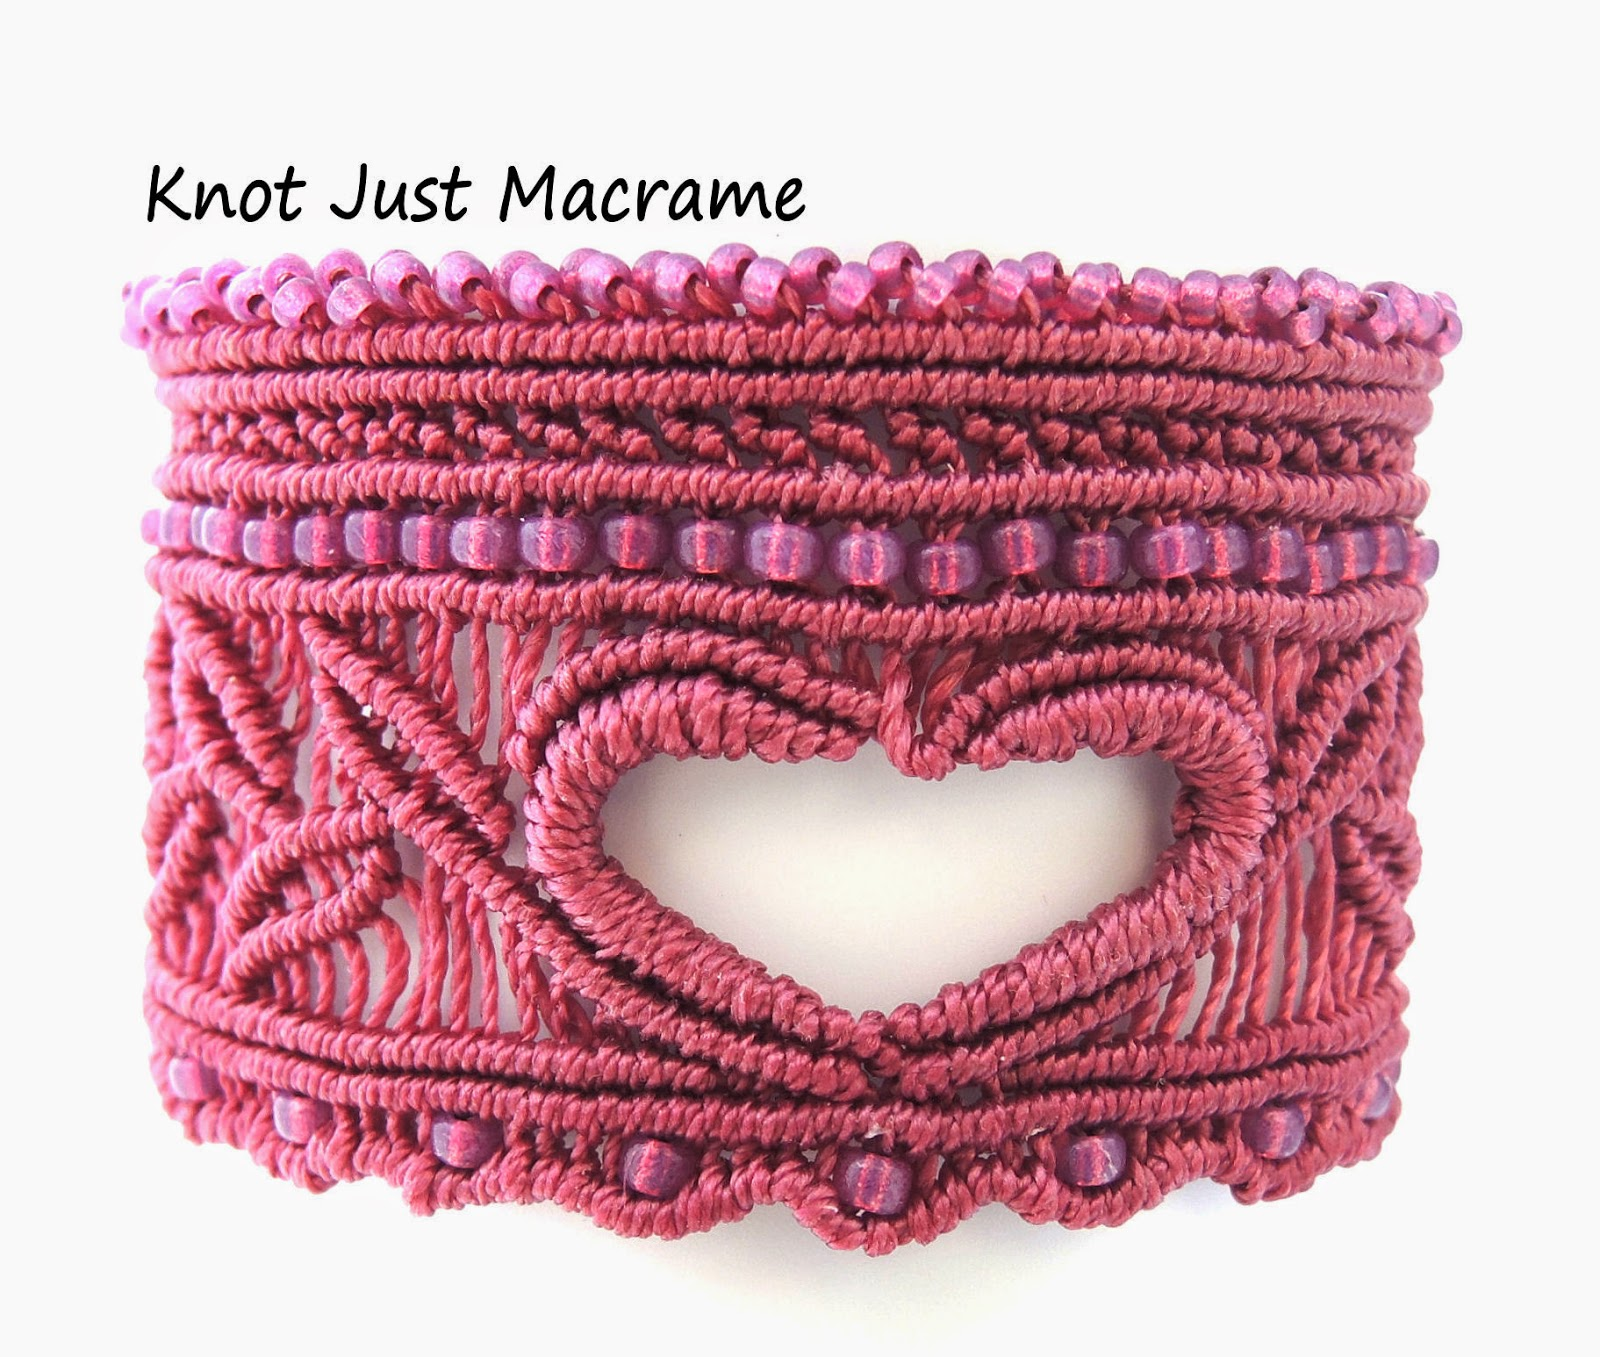 Valentine's Day cuff in micro macrame by Sherri Stokey